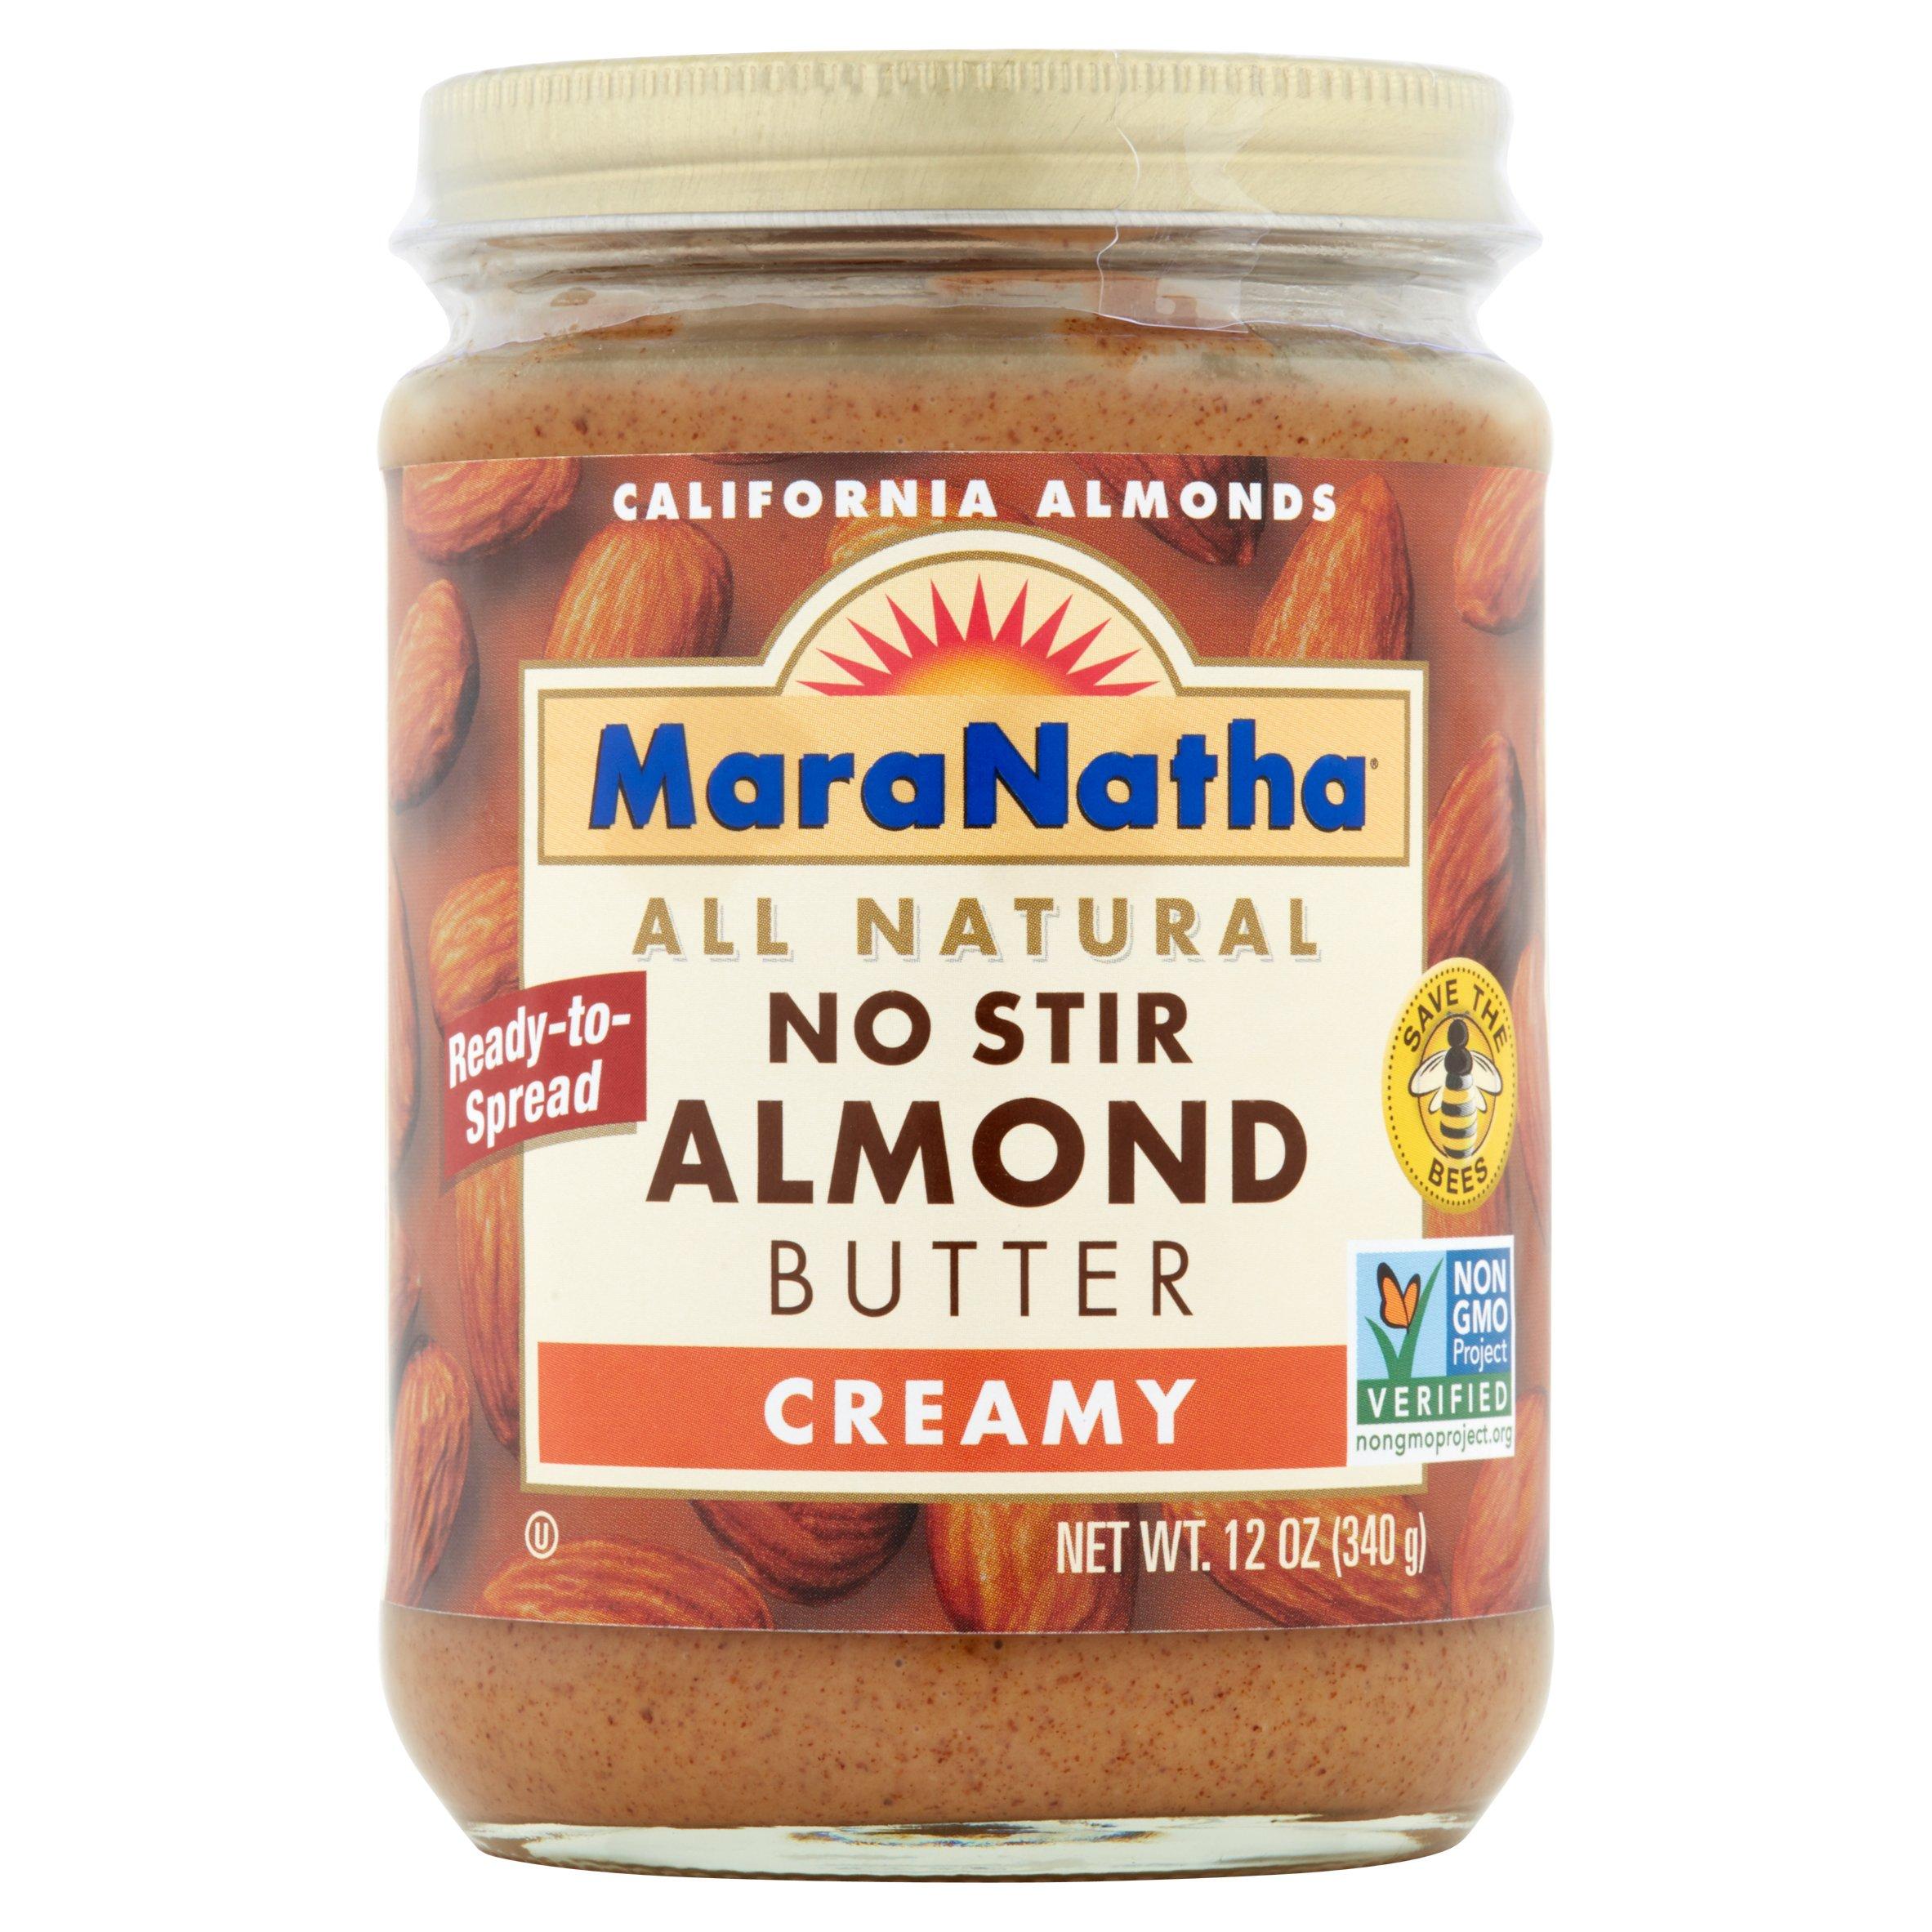 MaraNatha No Stir Creamy Almond Butter, 12 oz, 6 pack